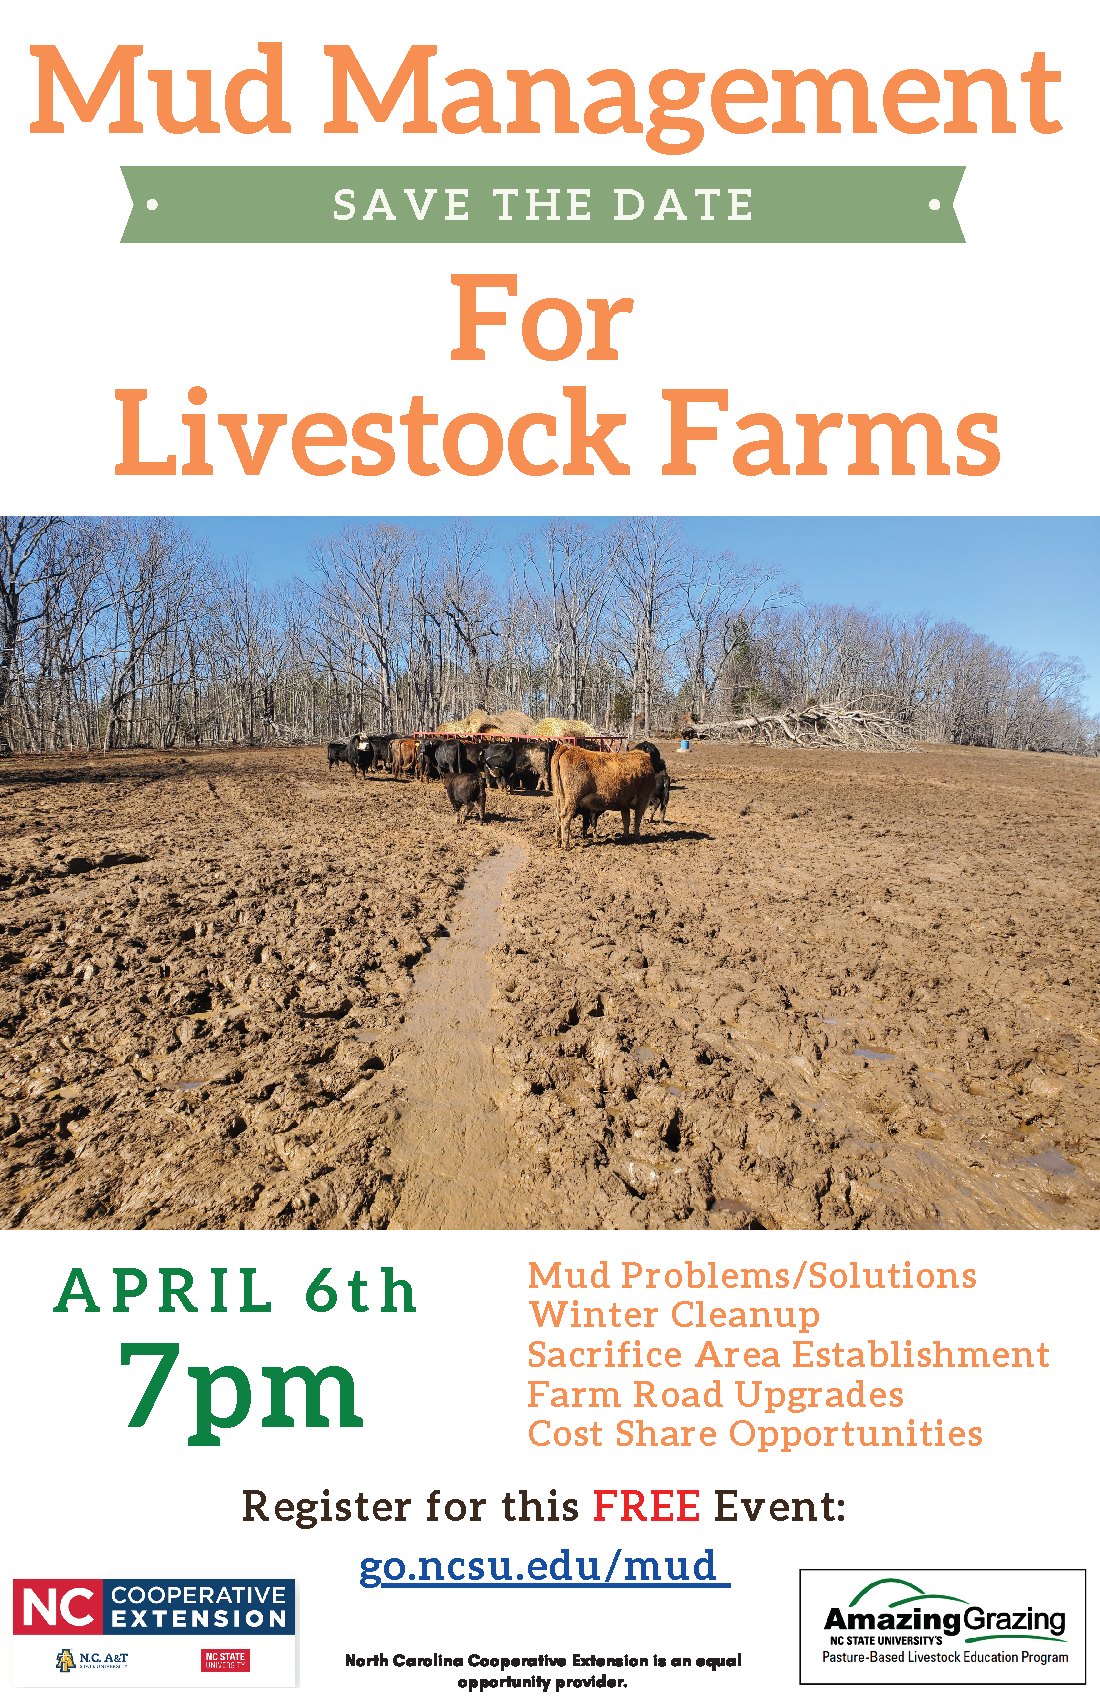 Cattle in muddy field